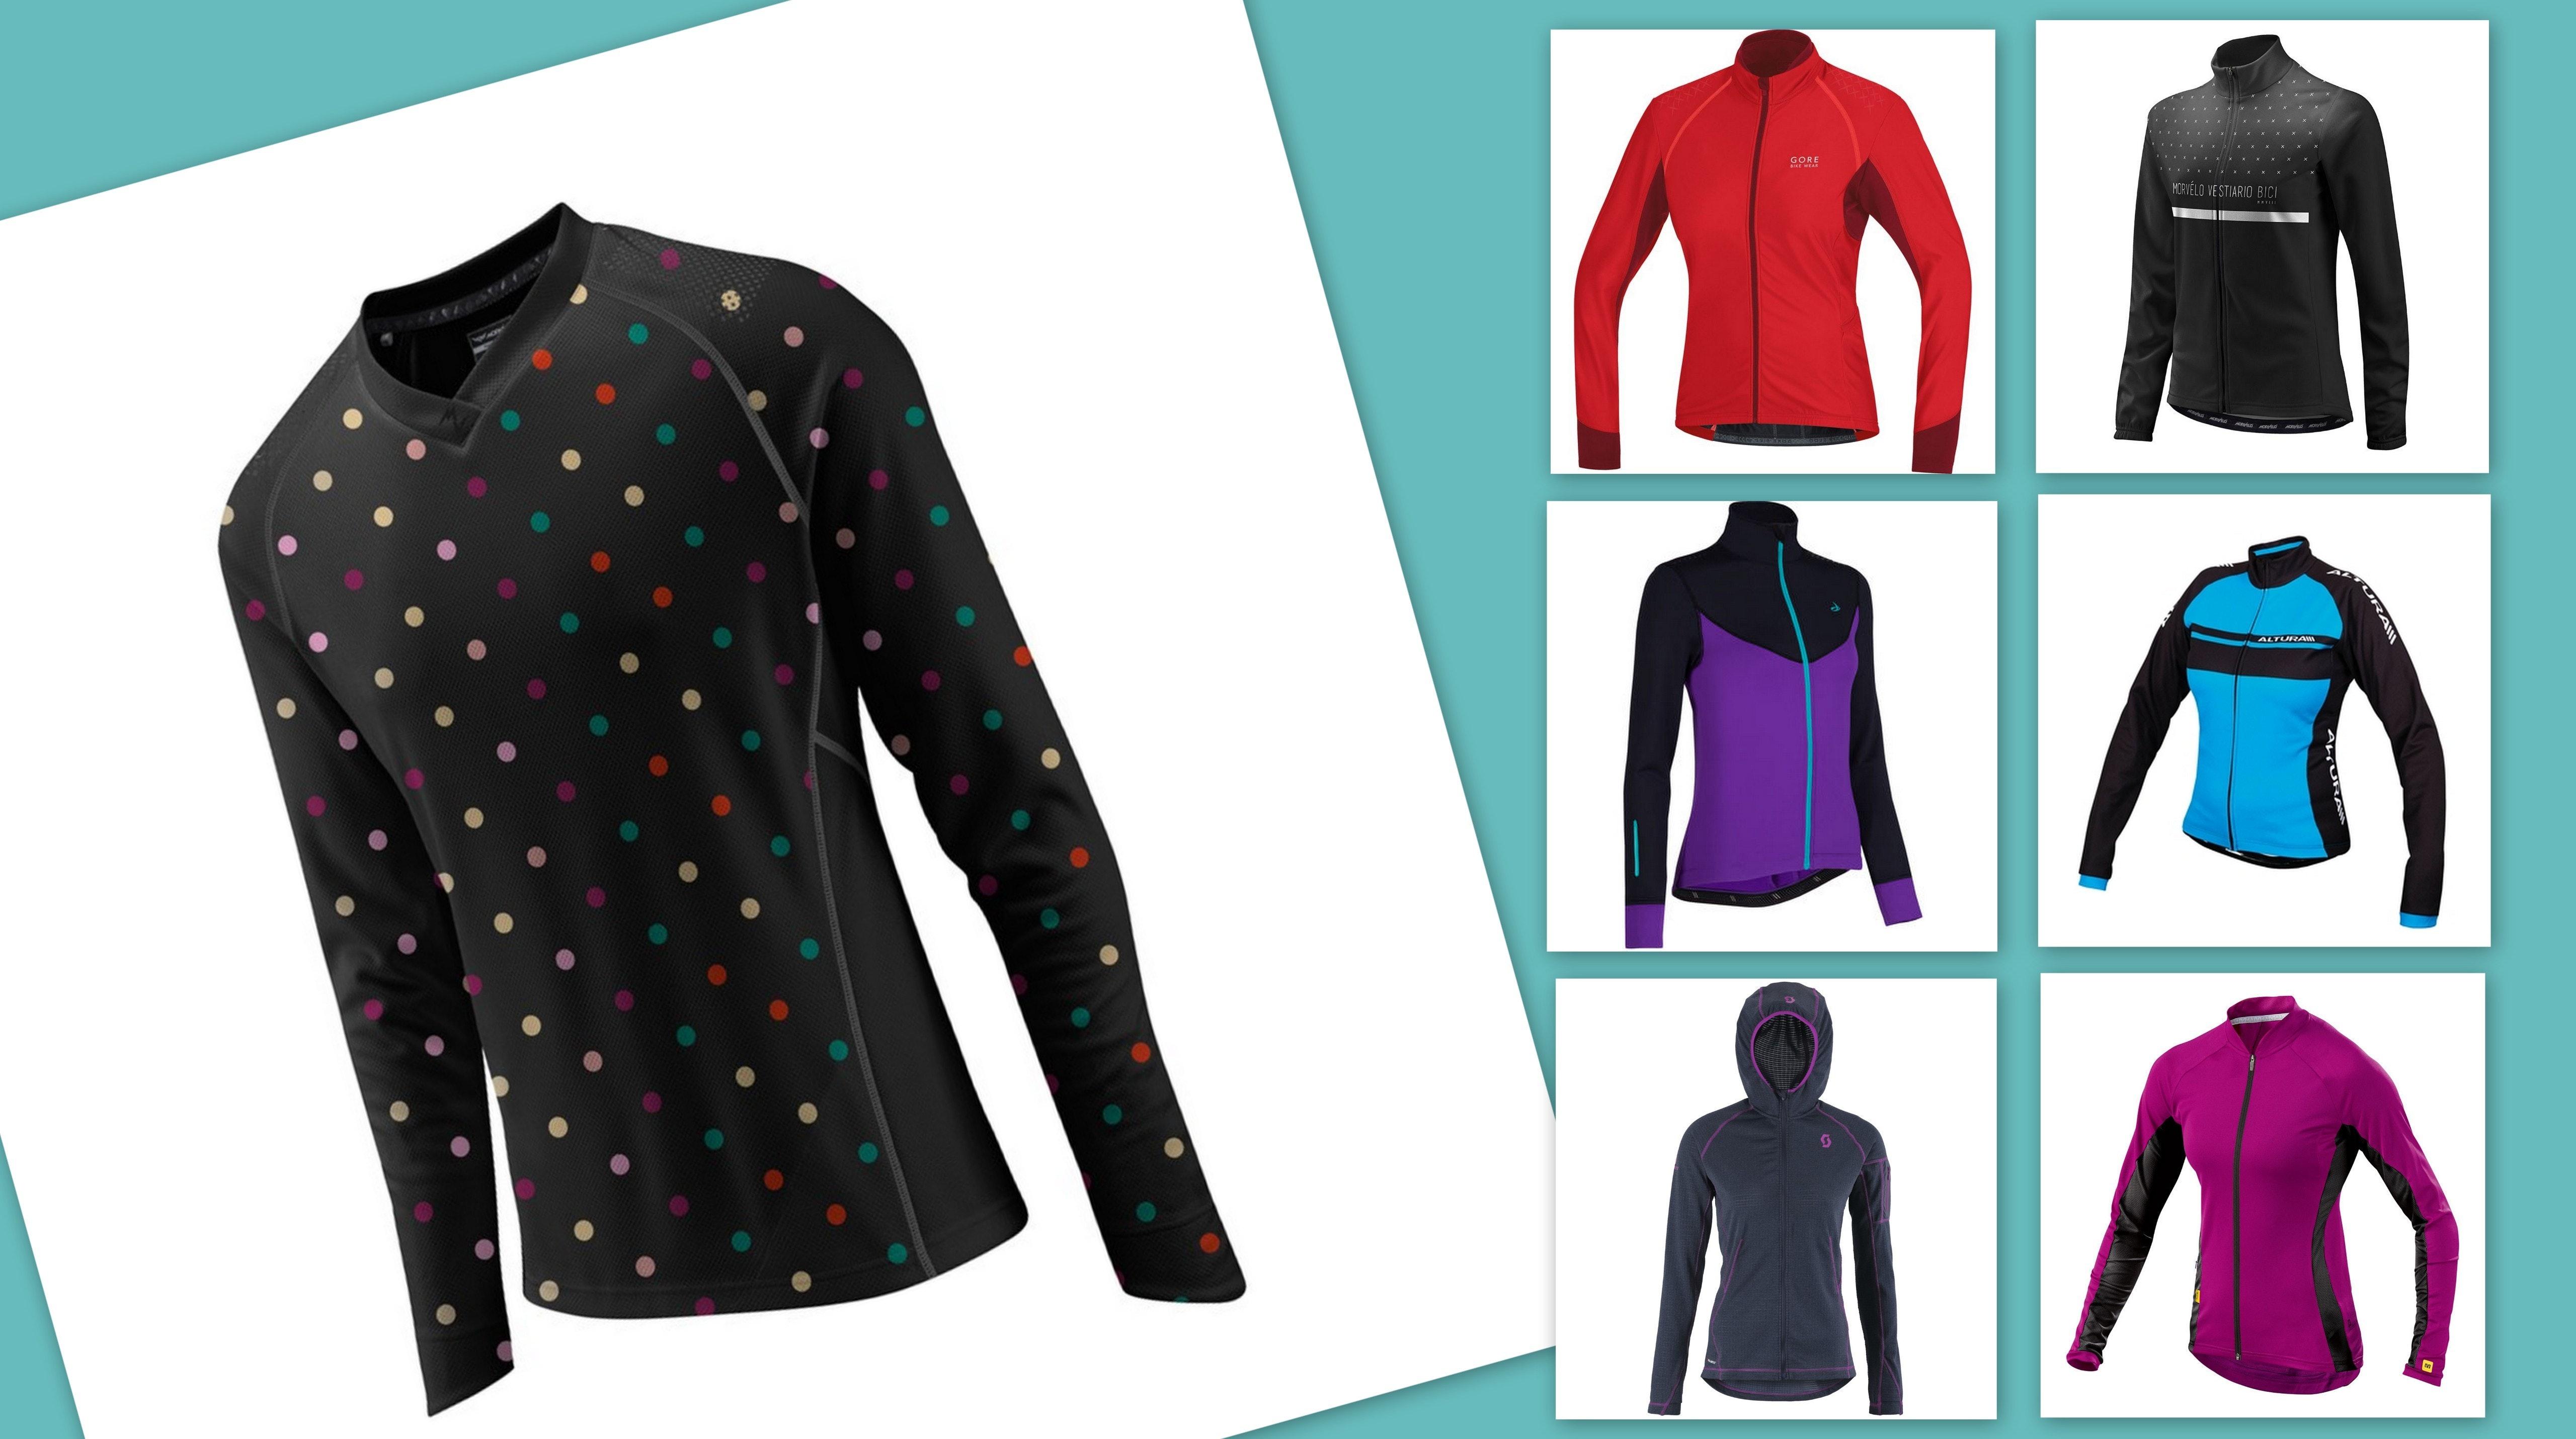 8 Winter MTB Jerseys collage